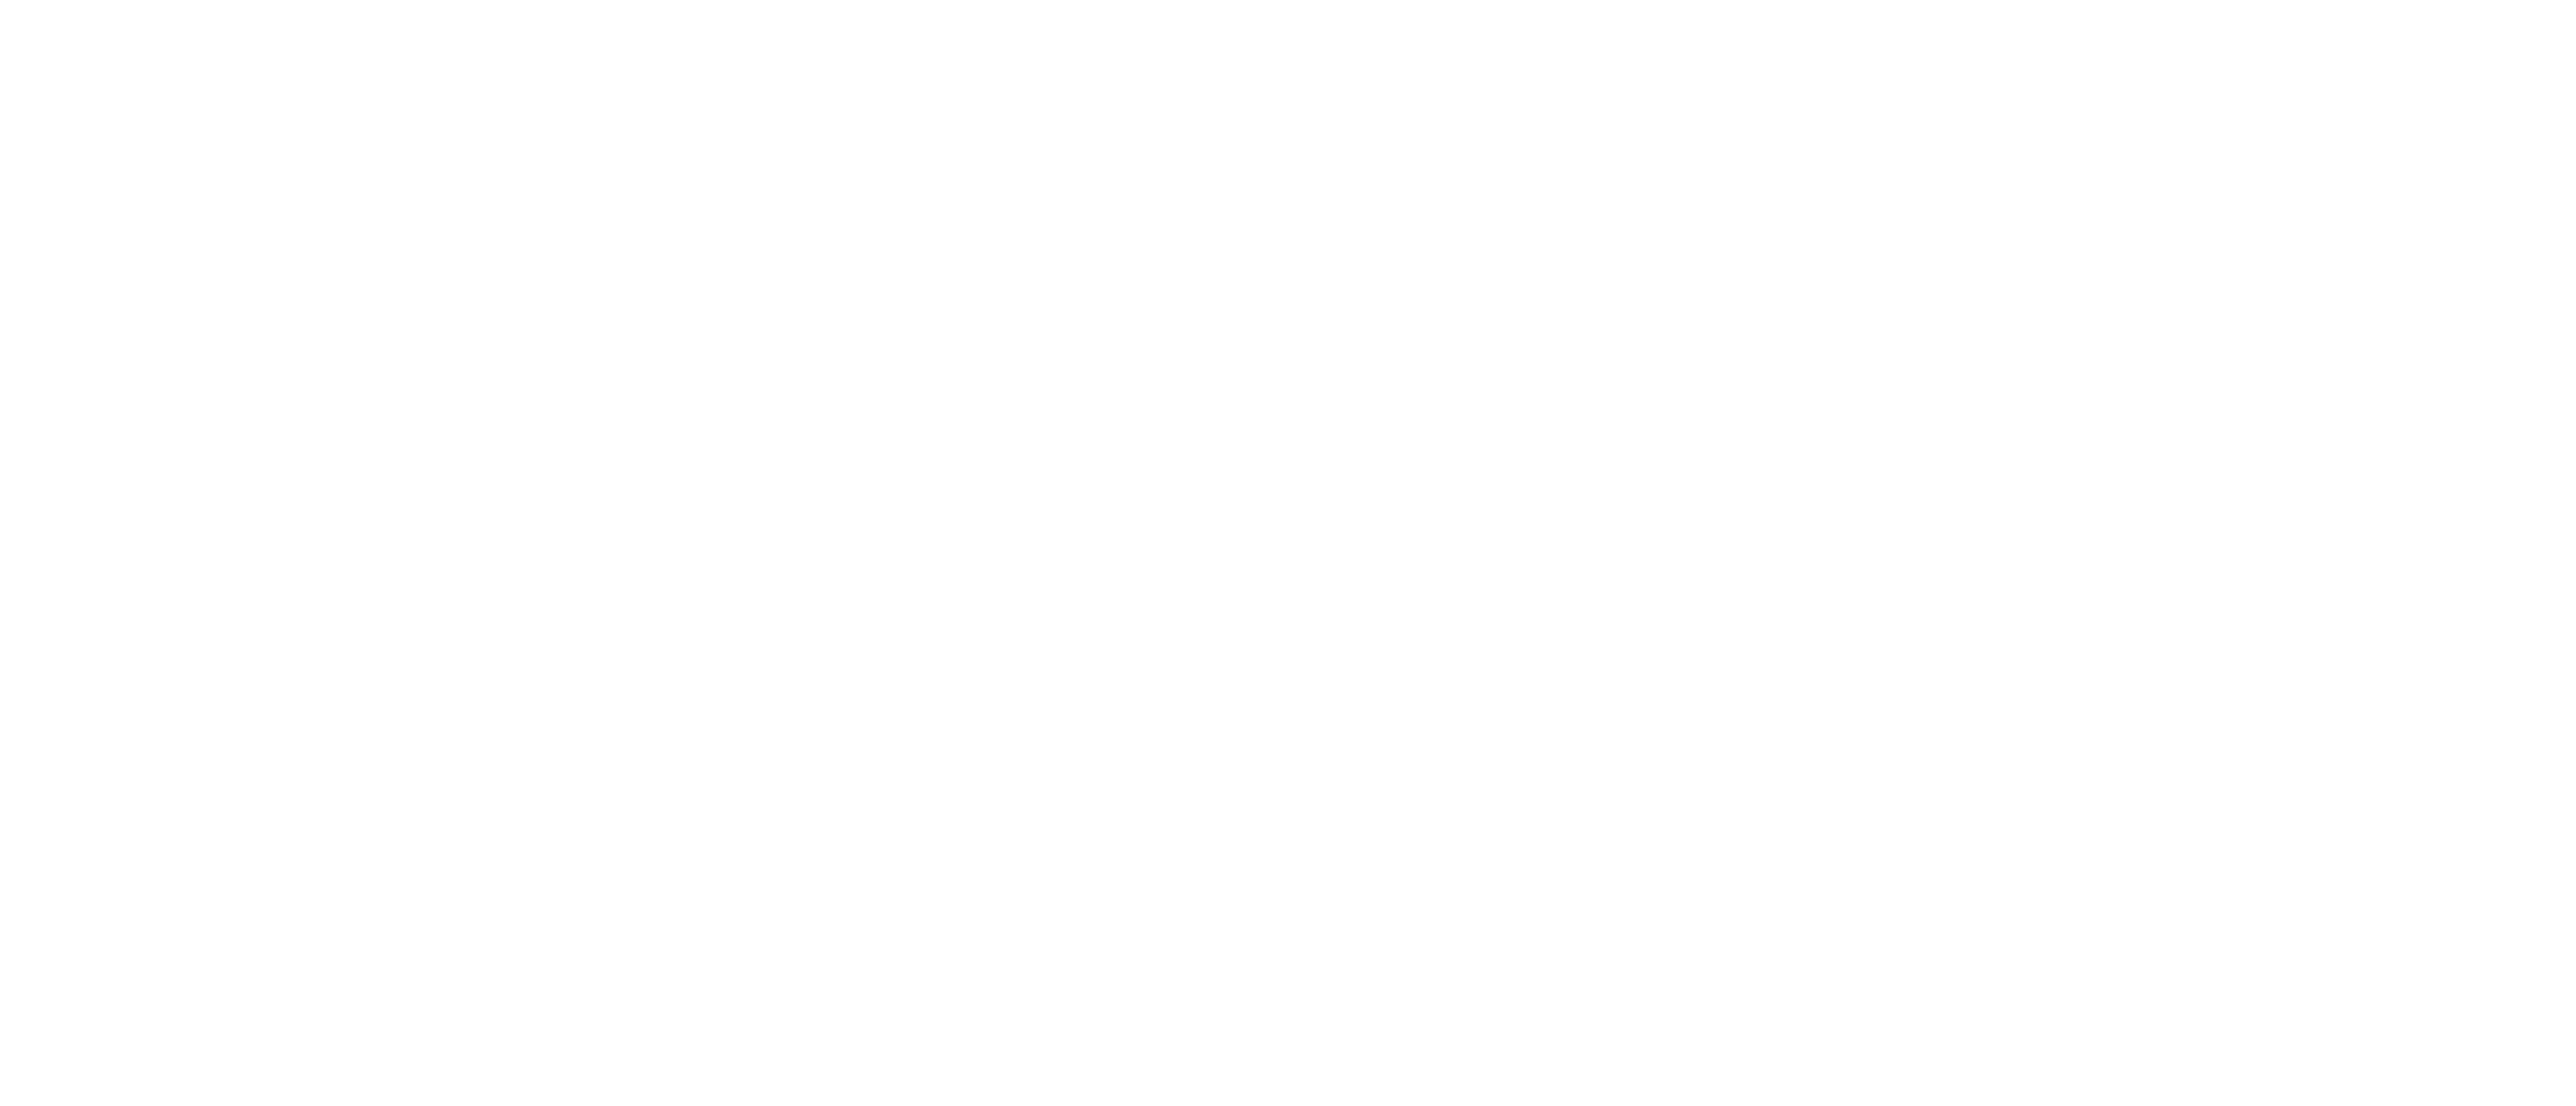 Unite Flooring logo in white